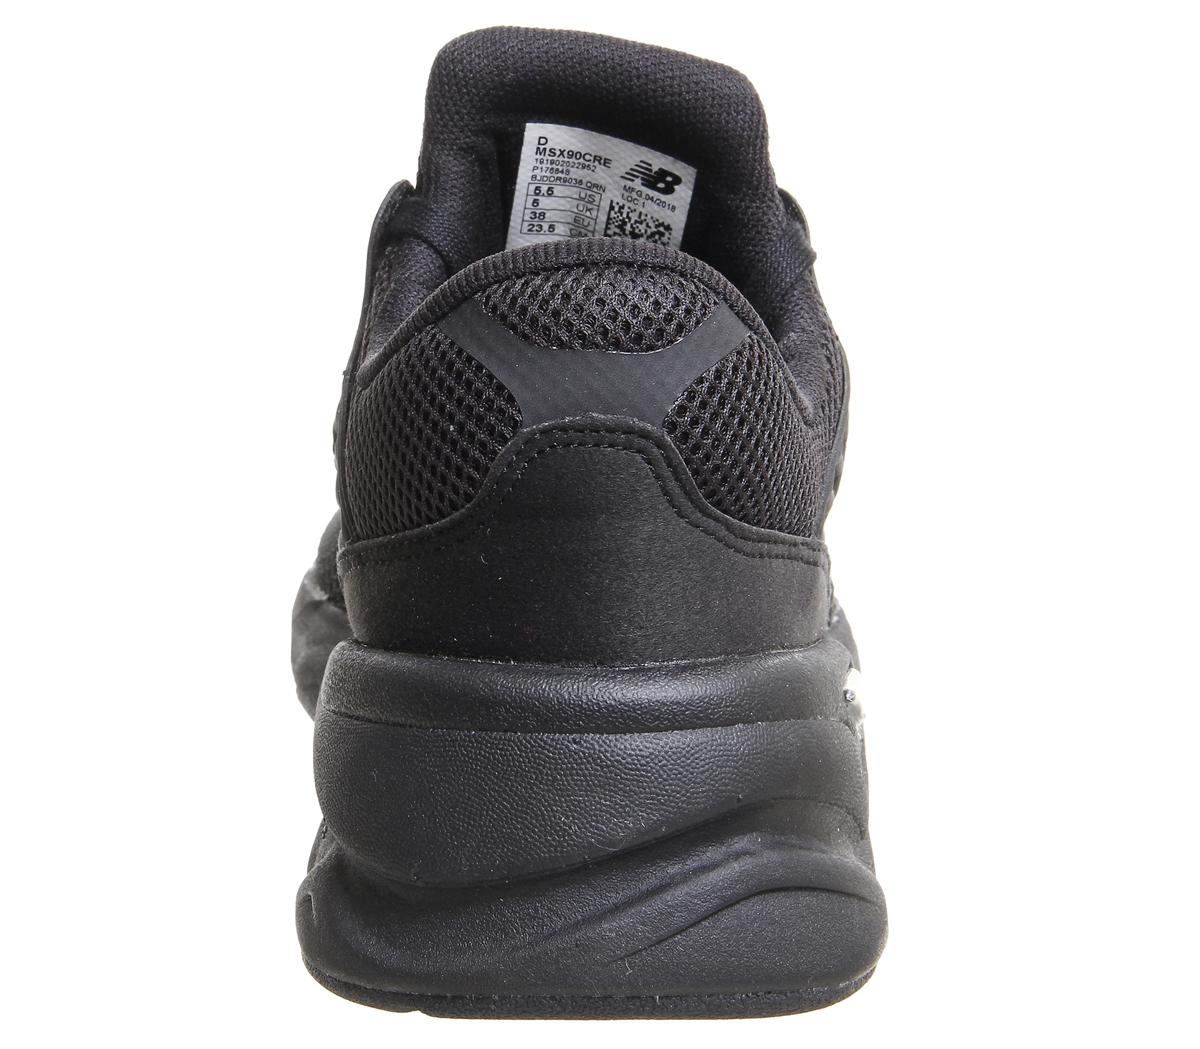 a7f0c8d503c New-Balance-X90-Baskets-Noir-Mono-Baskets-Chaussures miniature